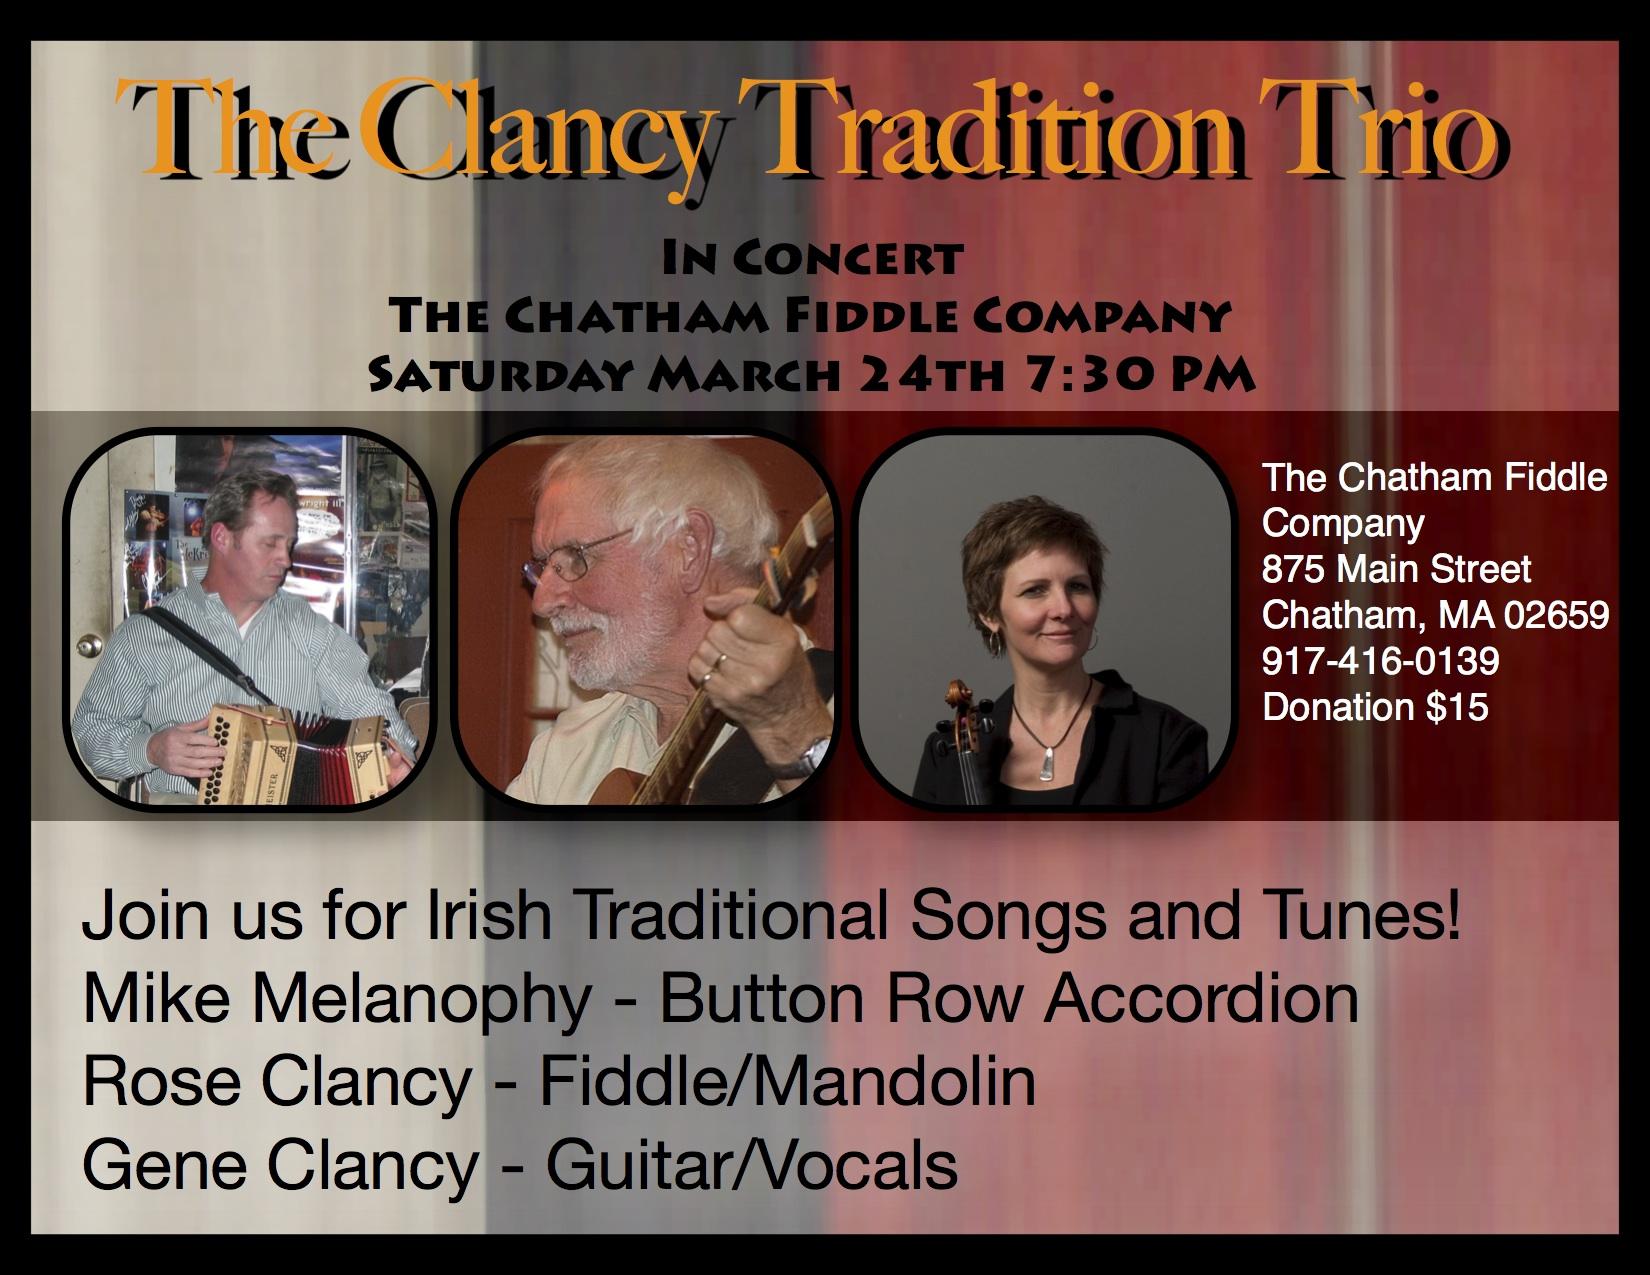 Clancy Trad Trio Poster New.jpg